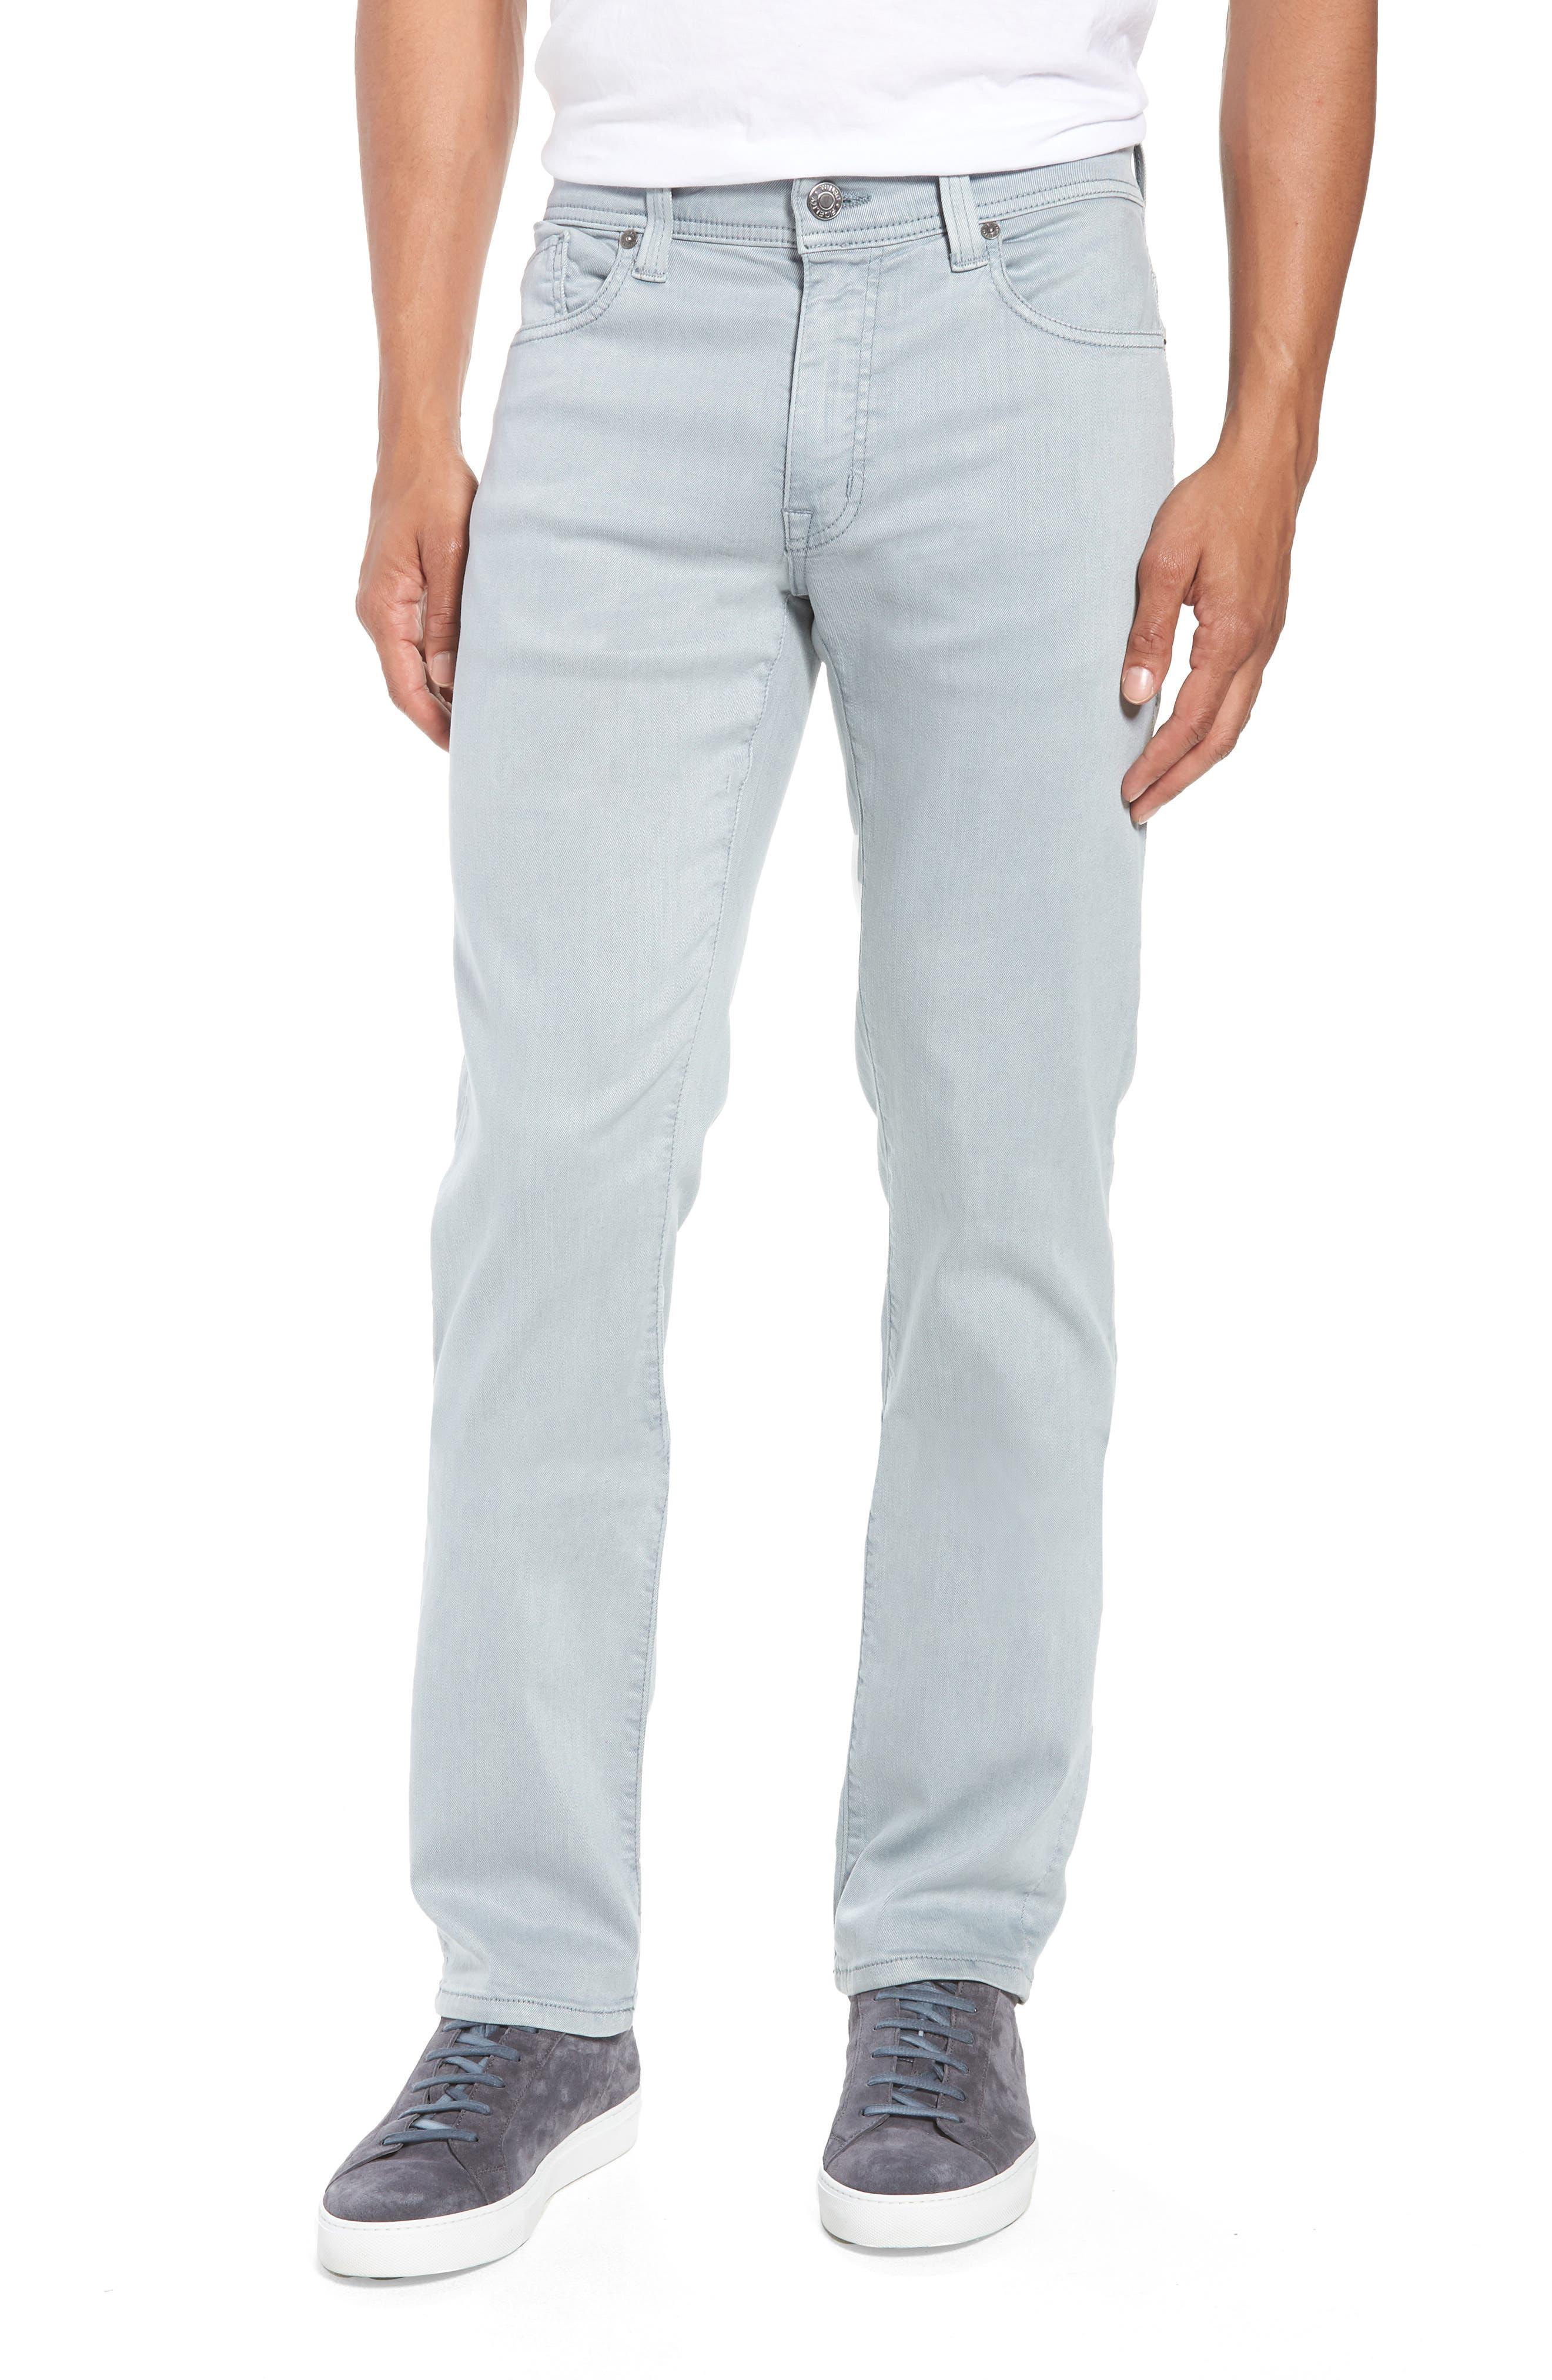 FIDELITY DENIM Fidelity Jimmy Slim Straight Leg Jeans, Main, color, 020